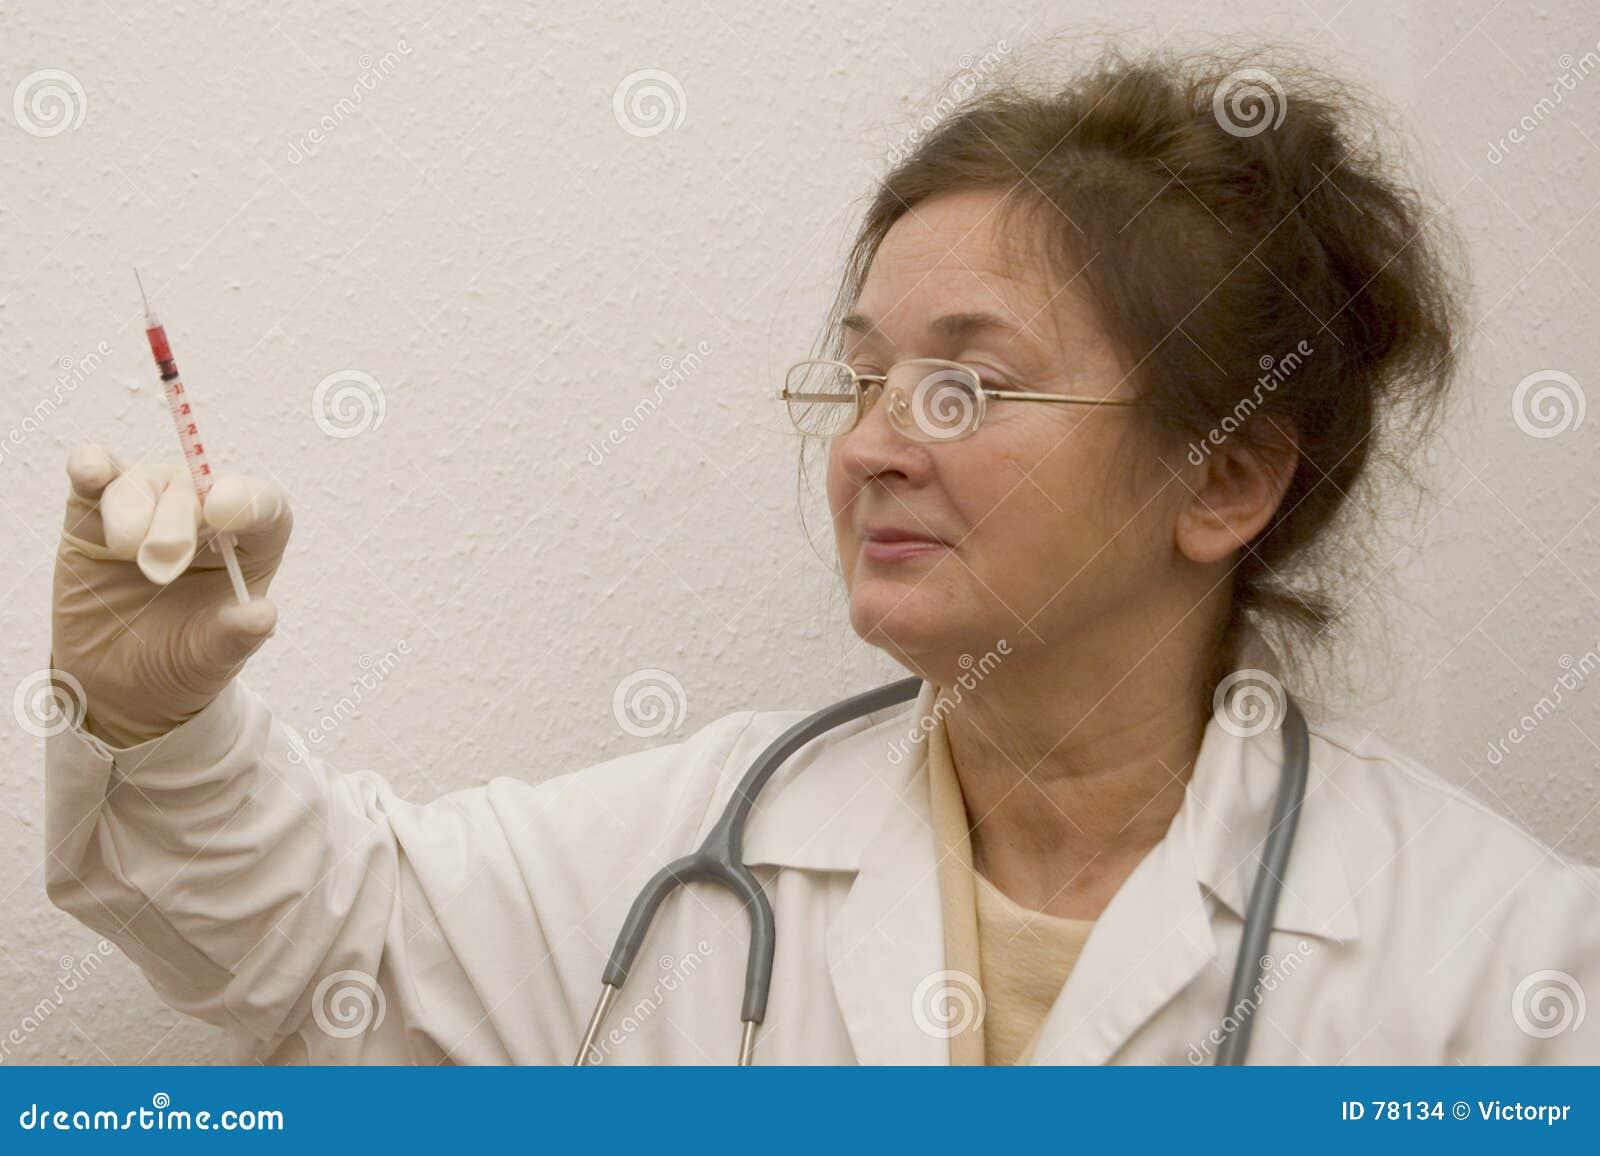 Doktor mit Spritze